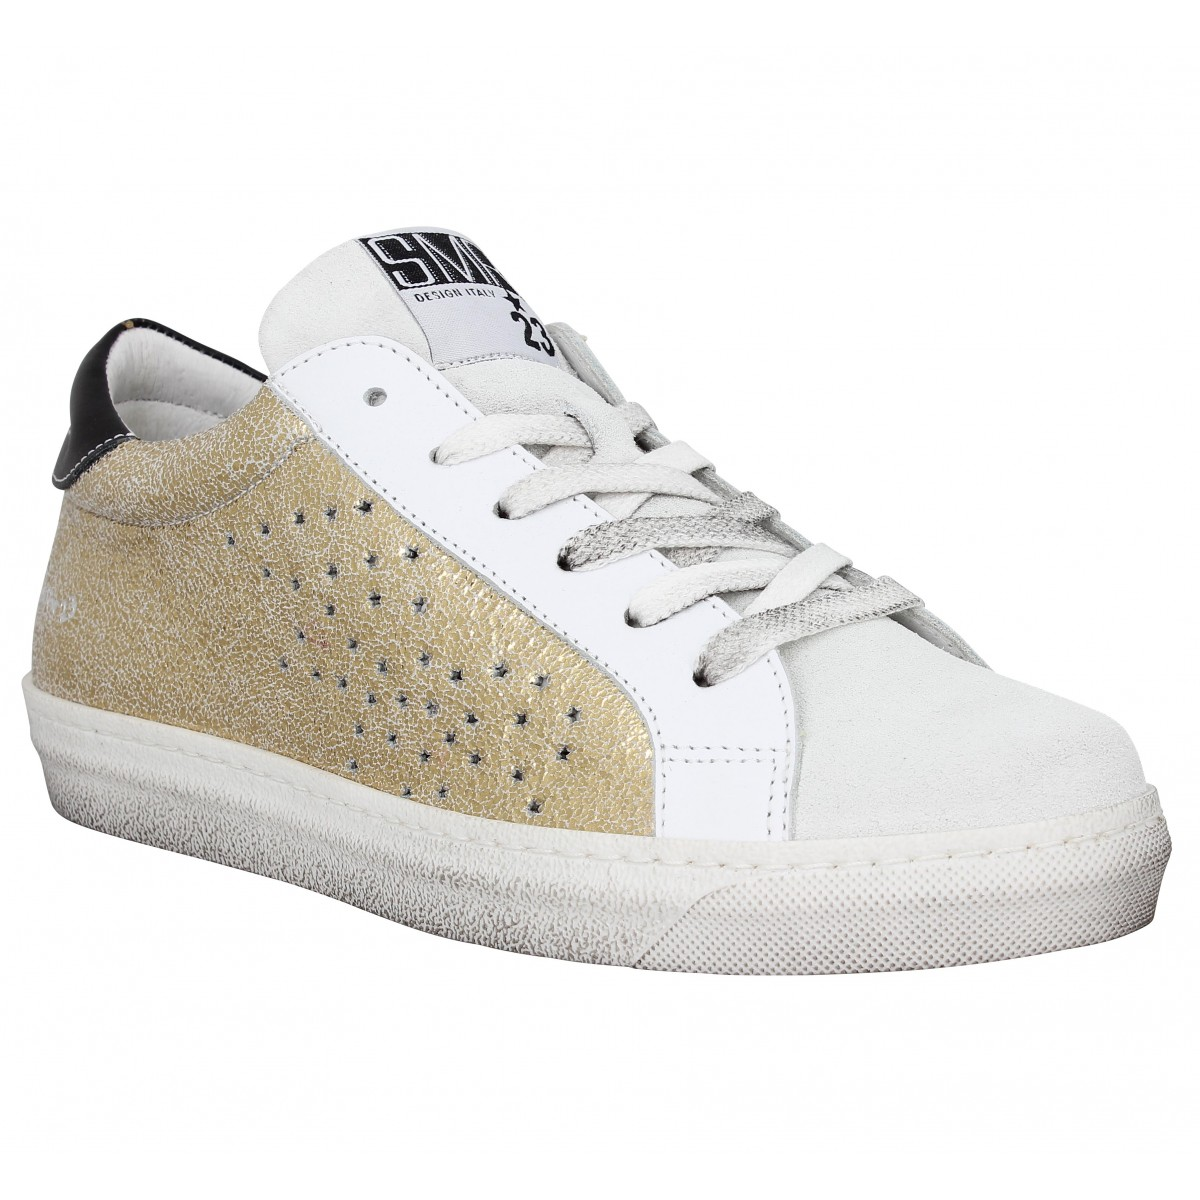 Semerdjian gecida star cuir velours femme or femme   Fanny chaussures bfb2e8734185